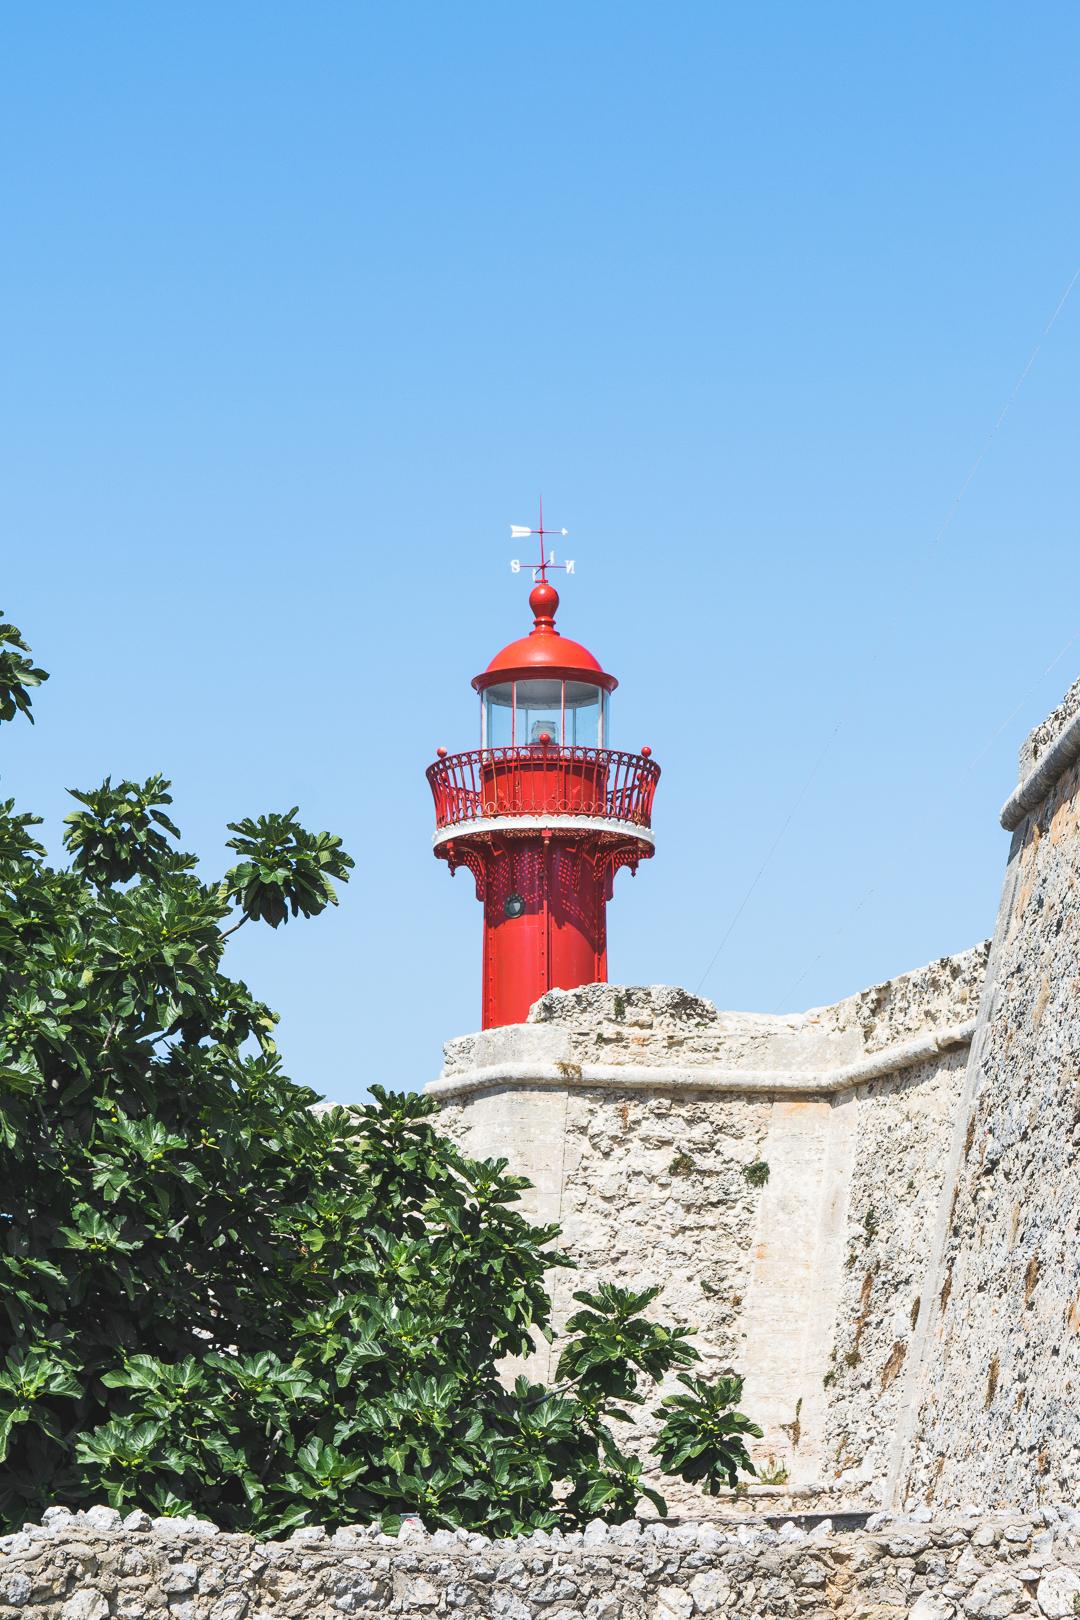 Red Lighthouse in Figueira da Foz Portugal